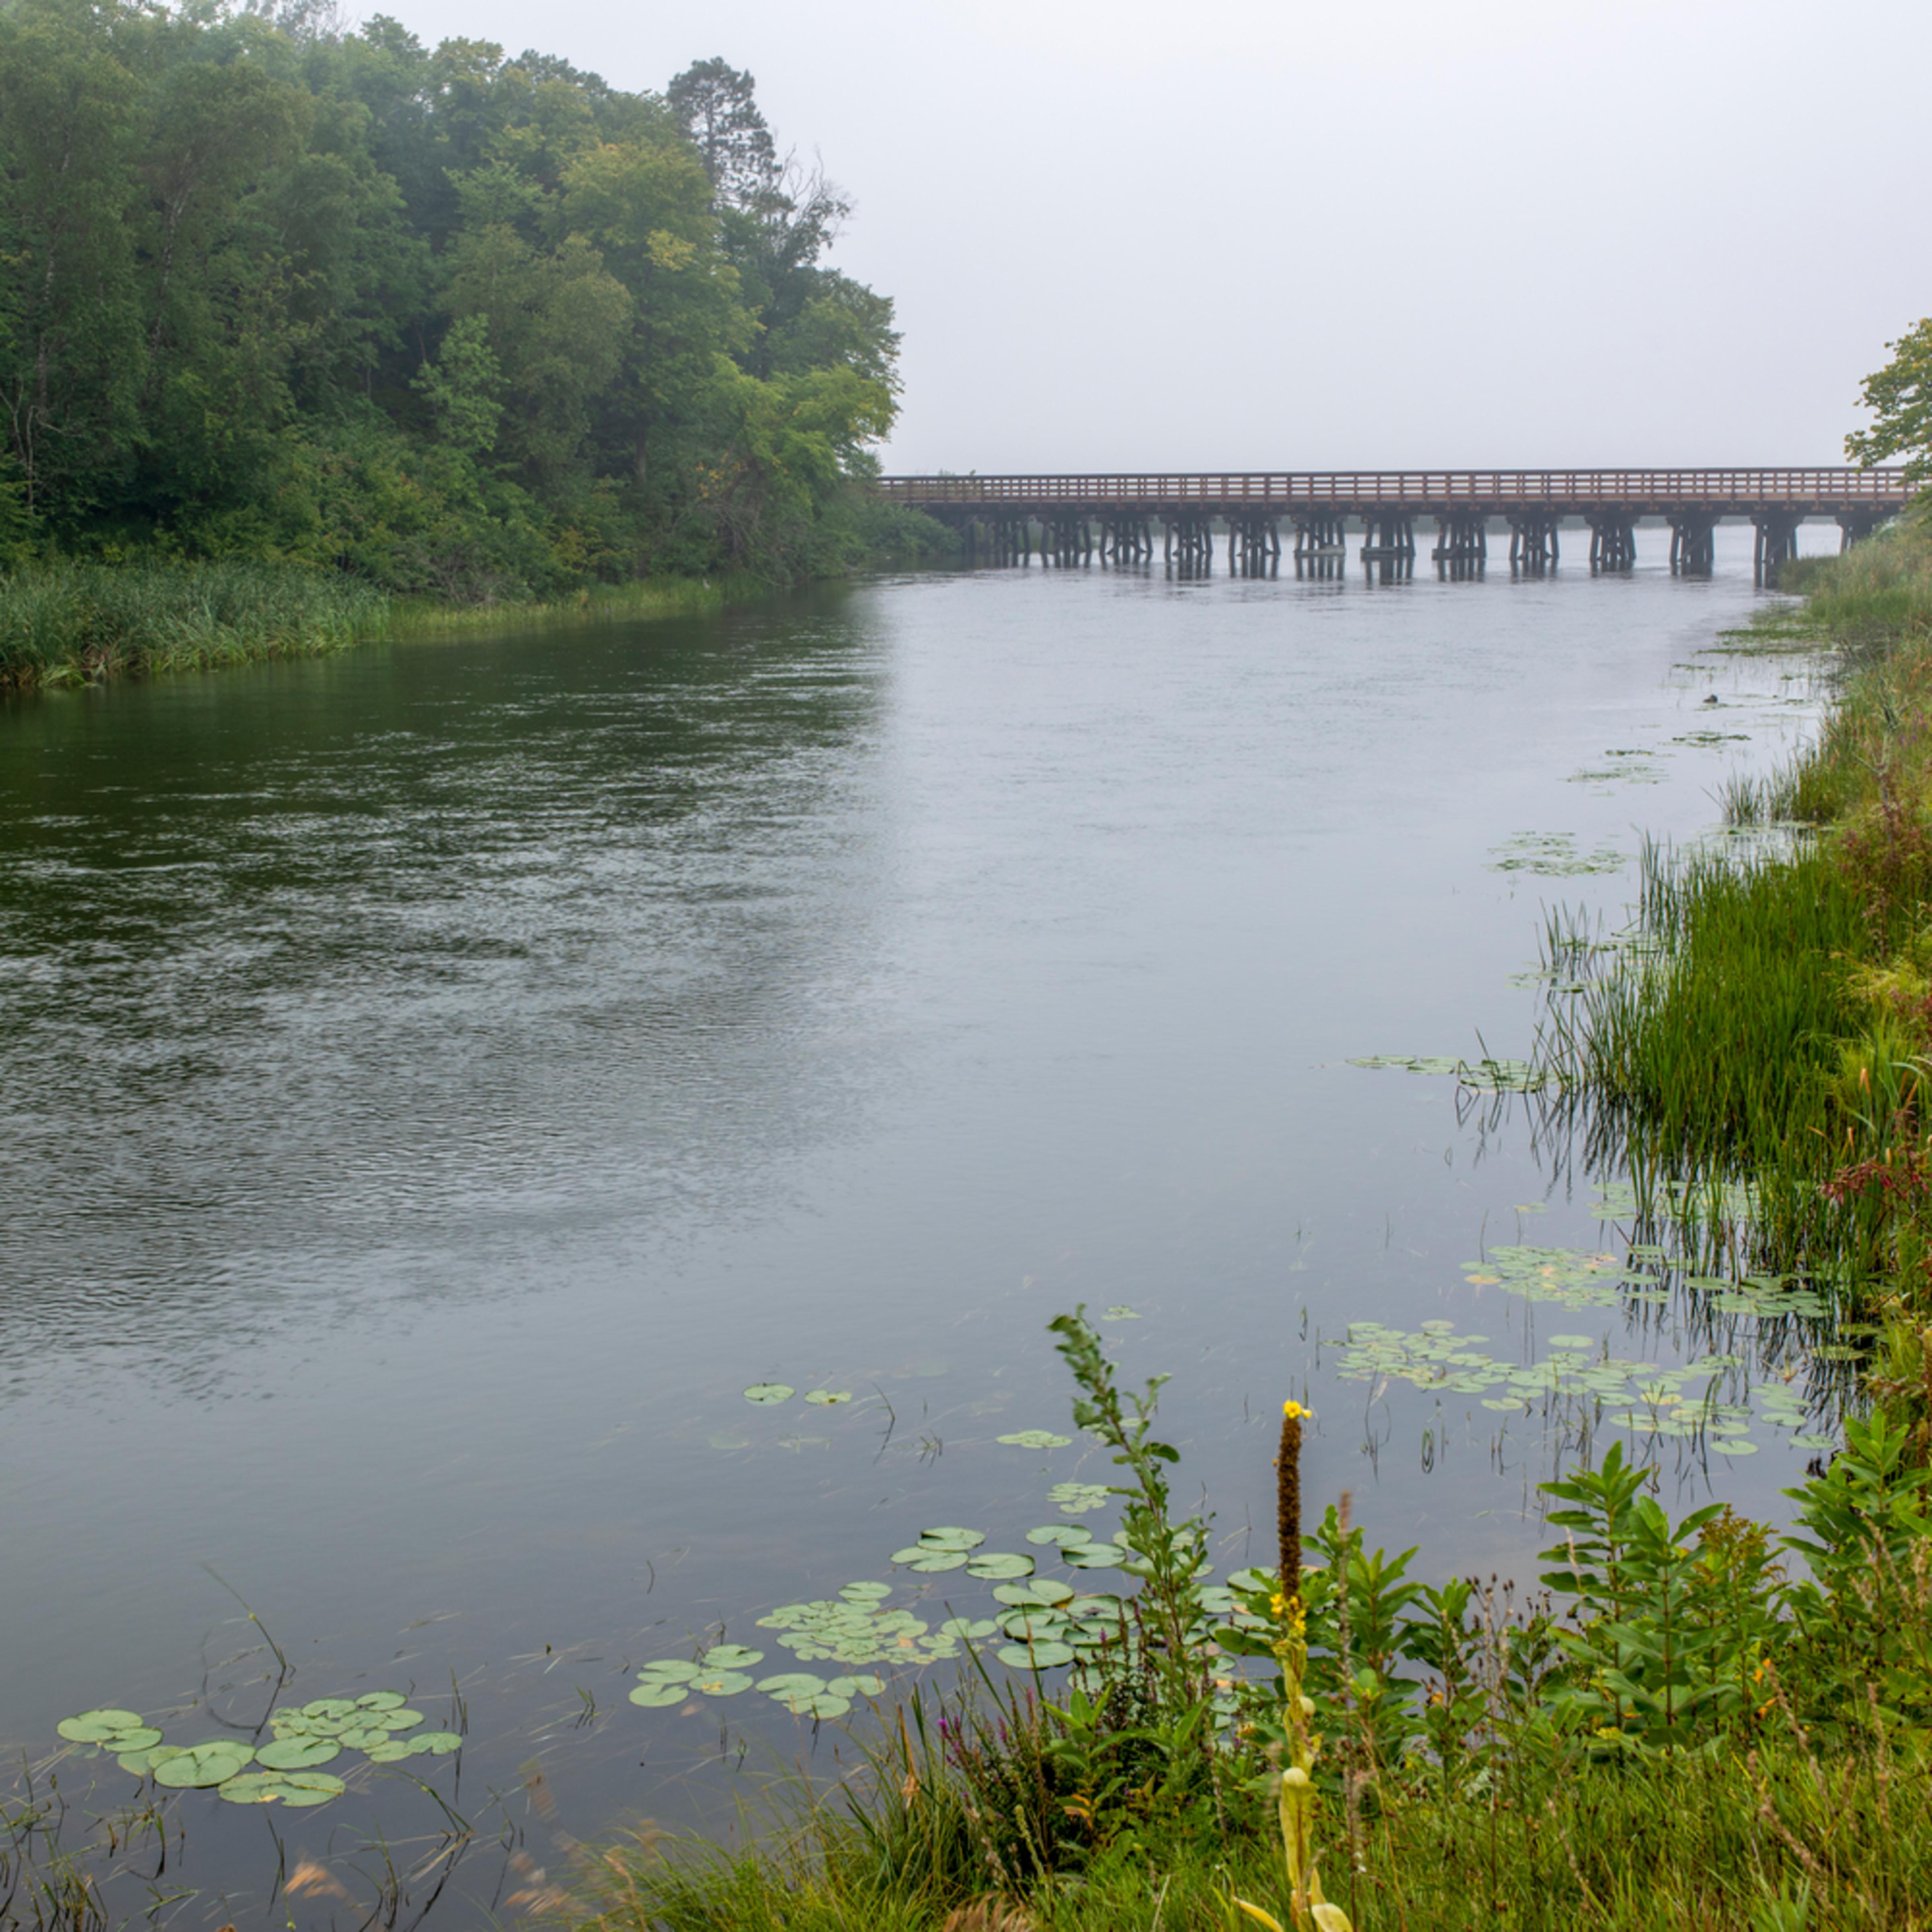 Dp661 mississippi river lake bemidji rec trail htdhee